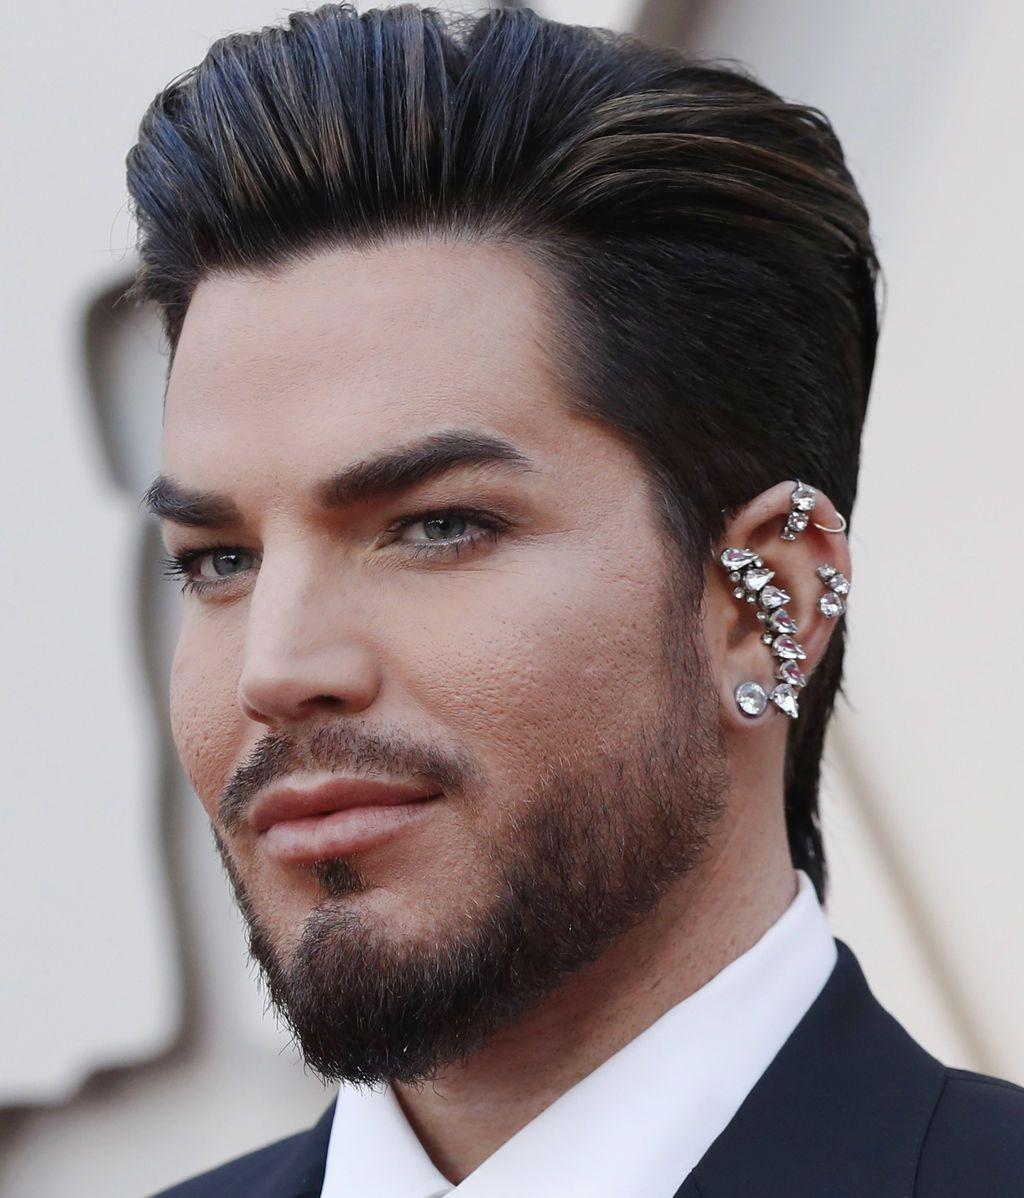 Llega a los Premios Oscars 2019 el cantante Adam Lambert